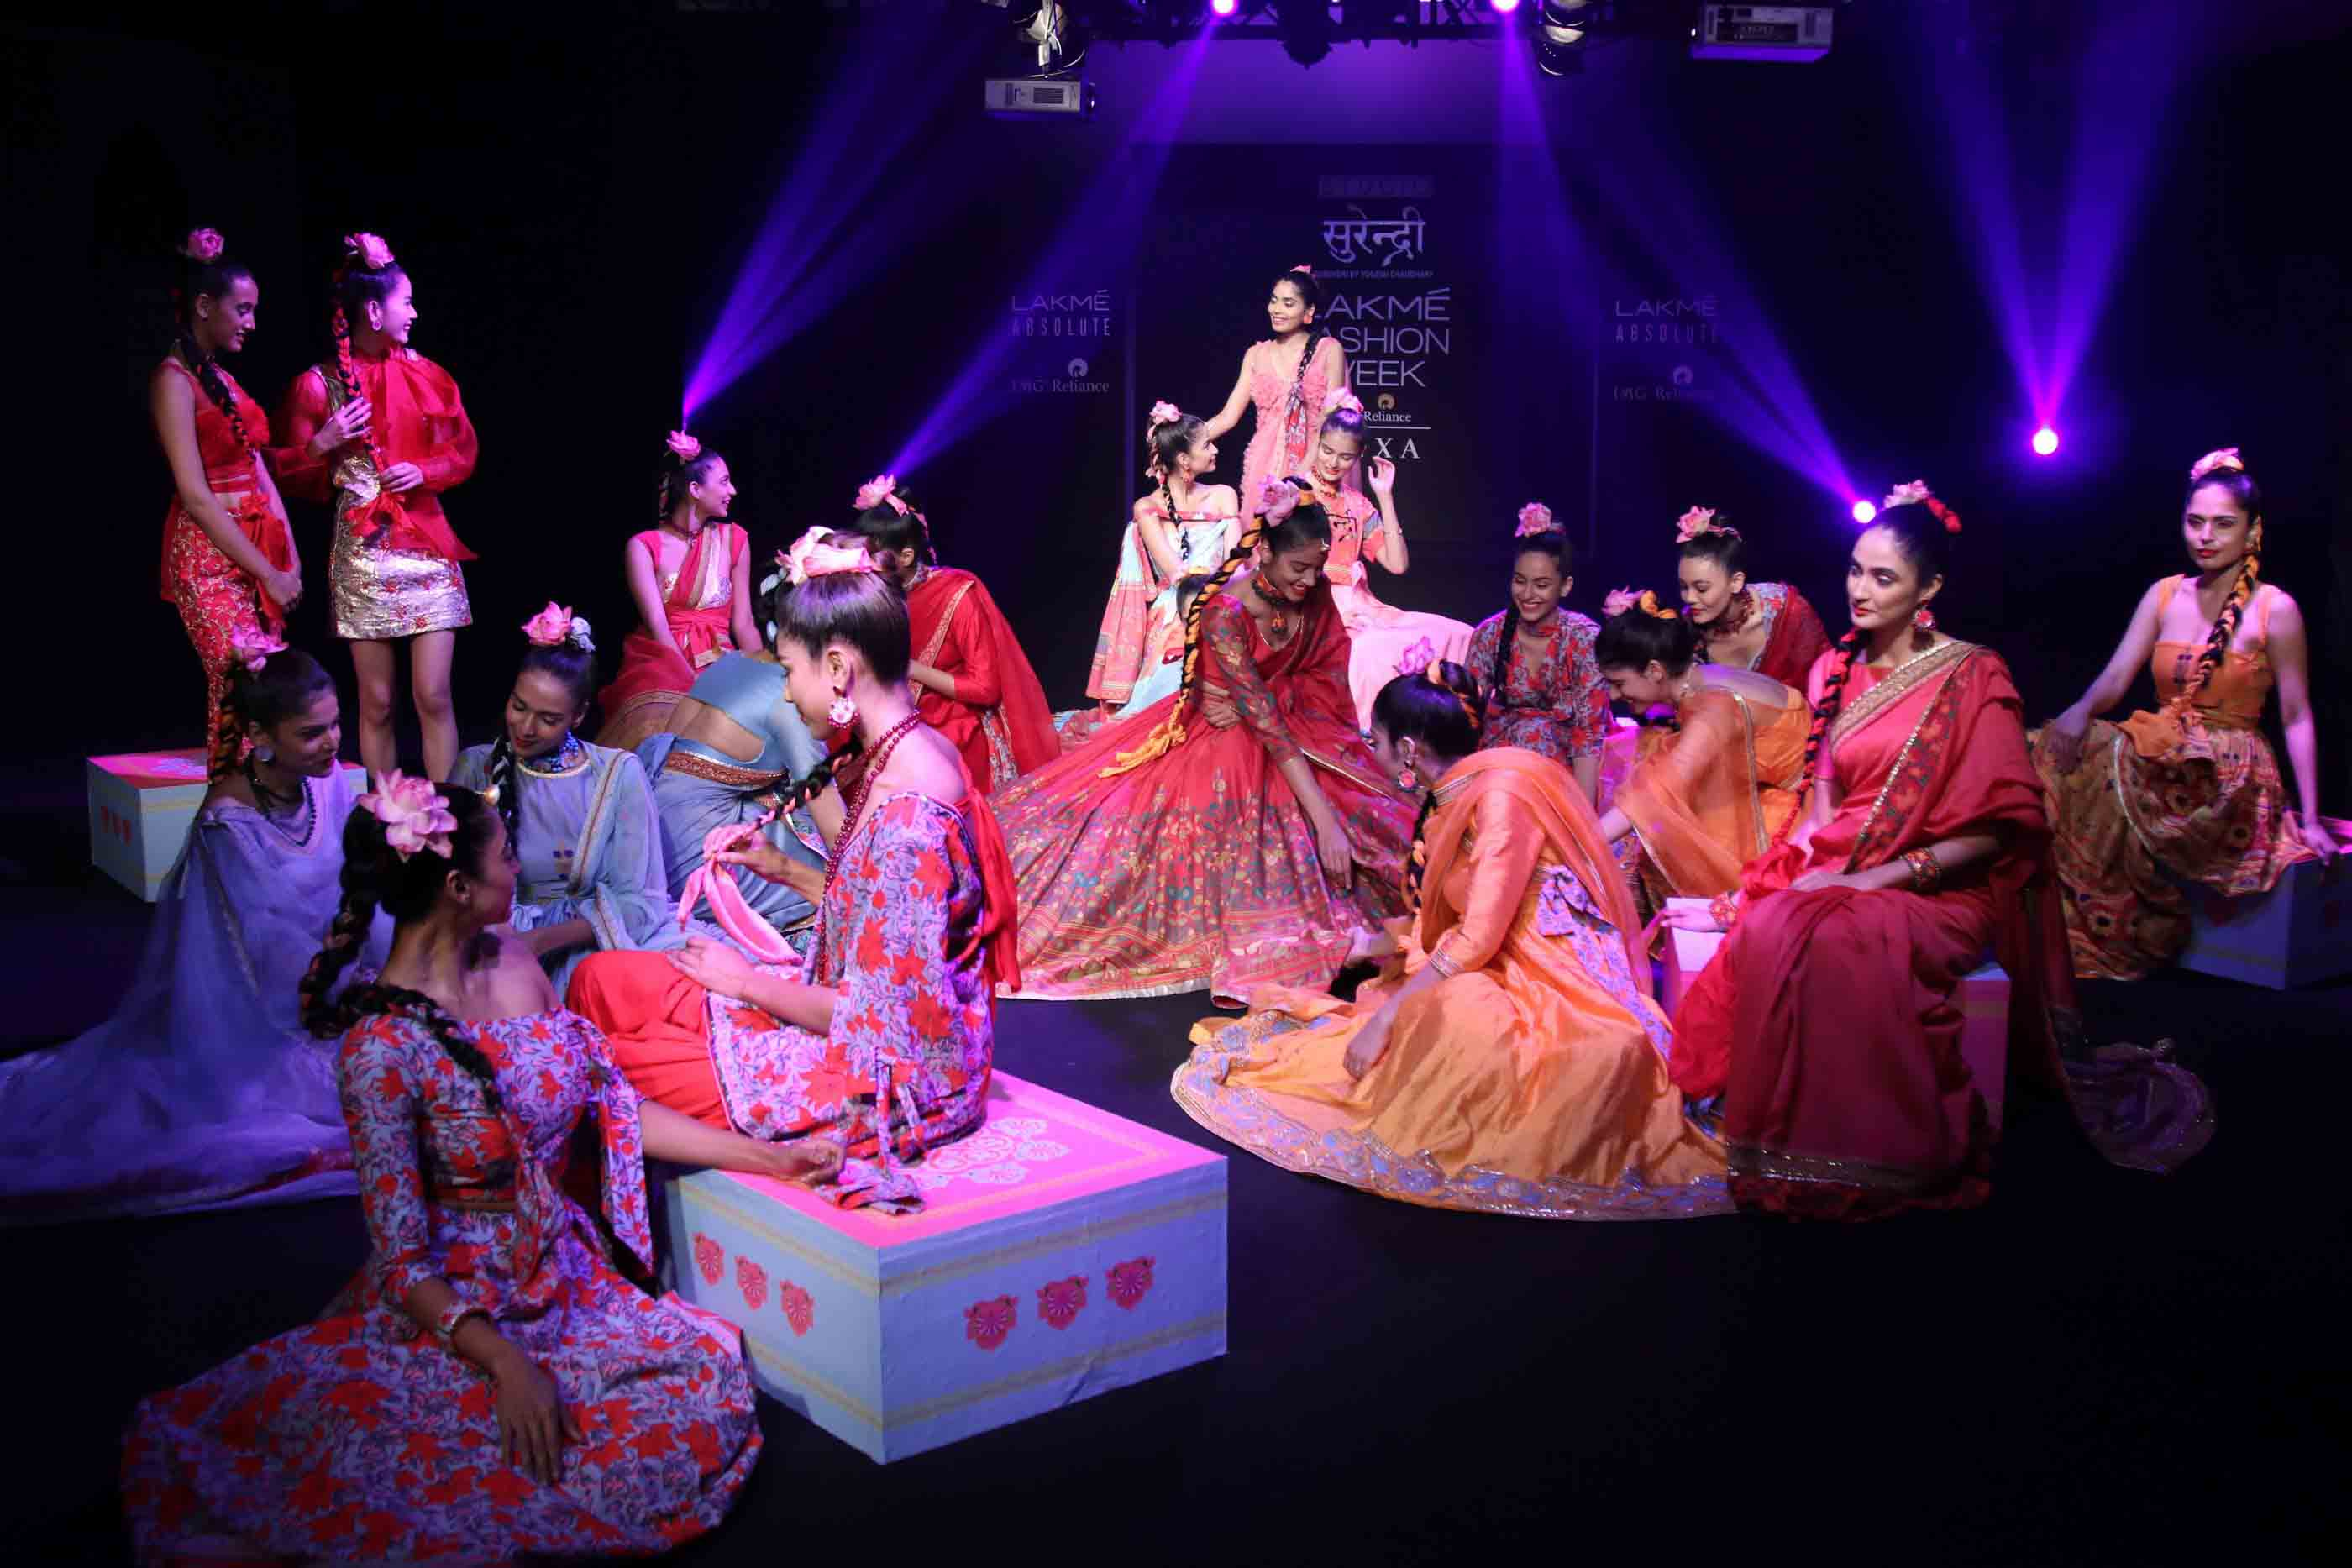 Anushree Reddy, Ashish N Soni, Fashion, Featured, Lakme Fashion Week, Lakmé Fashion Week 2018, Lakme Fashion Week Winter/Festive 2018, Online Exclusive, Pankaj and Nidhi, Payal Singhal, Sonam and Paras Modi, Style, Surendri, SVA, Urvashi Kaur, Winter/Festive, Yogesh Chaudhary